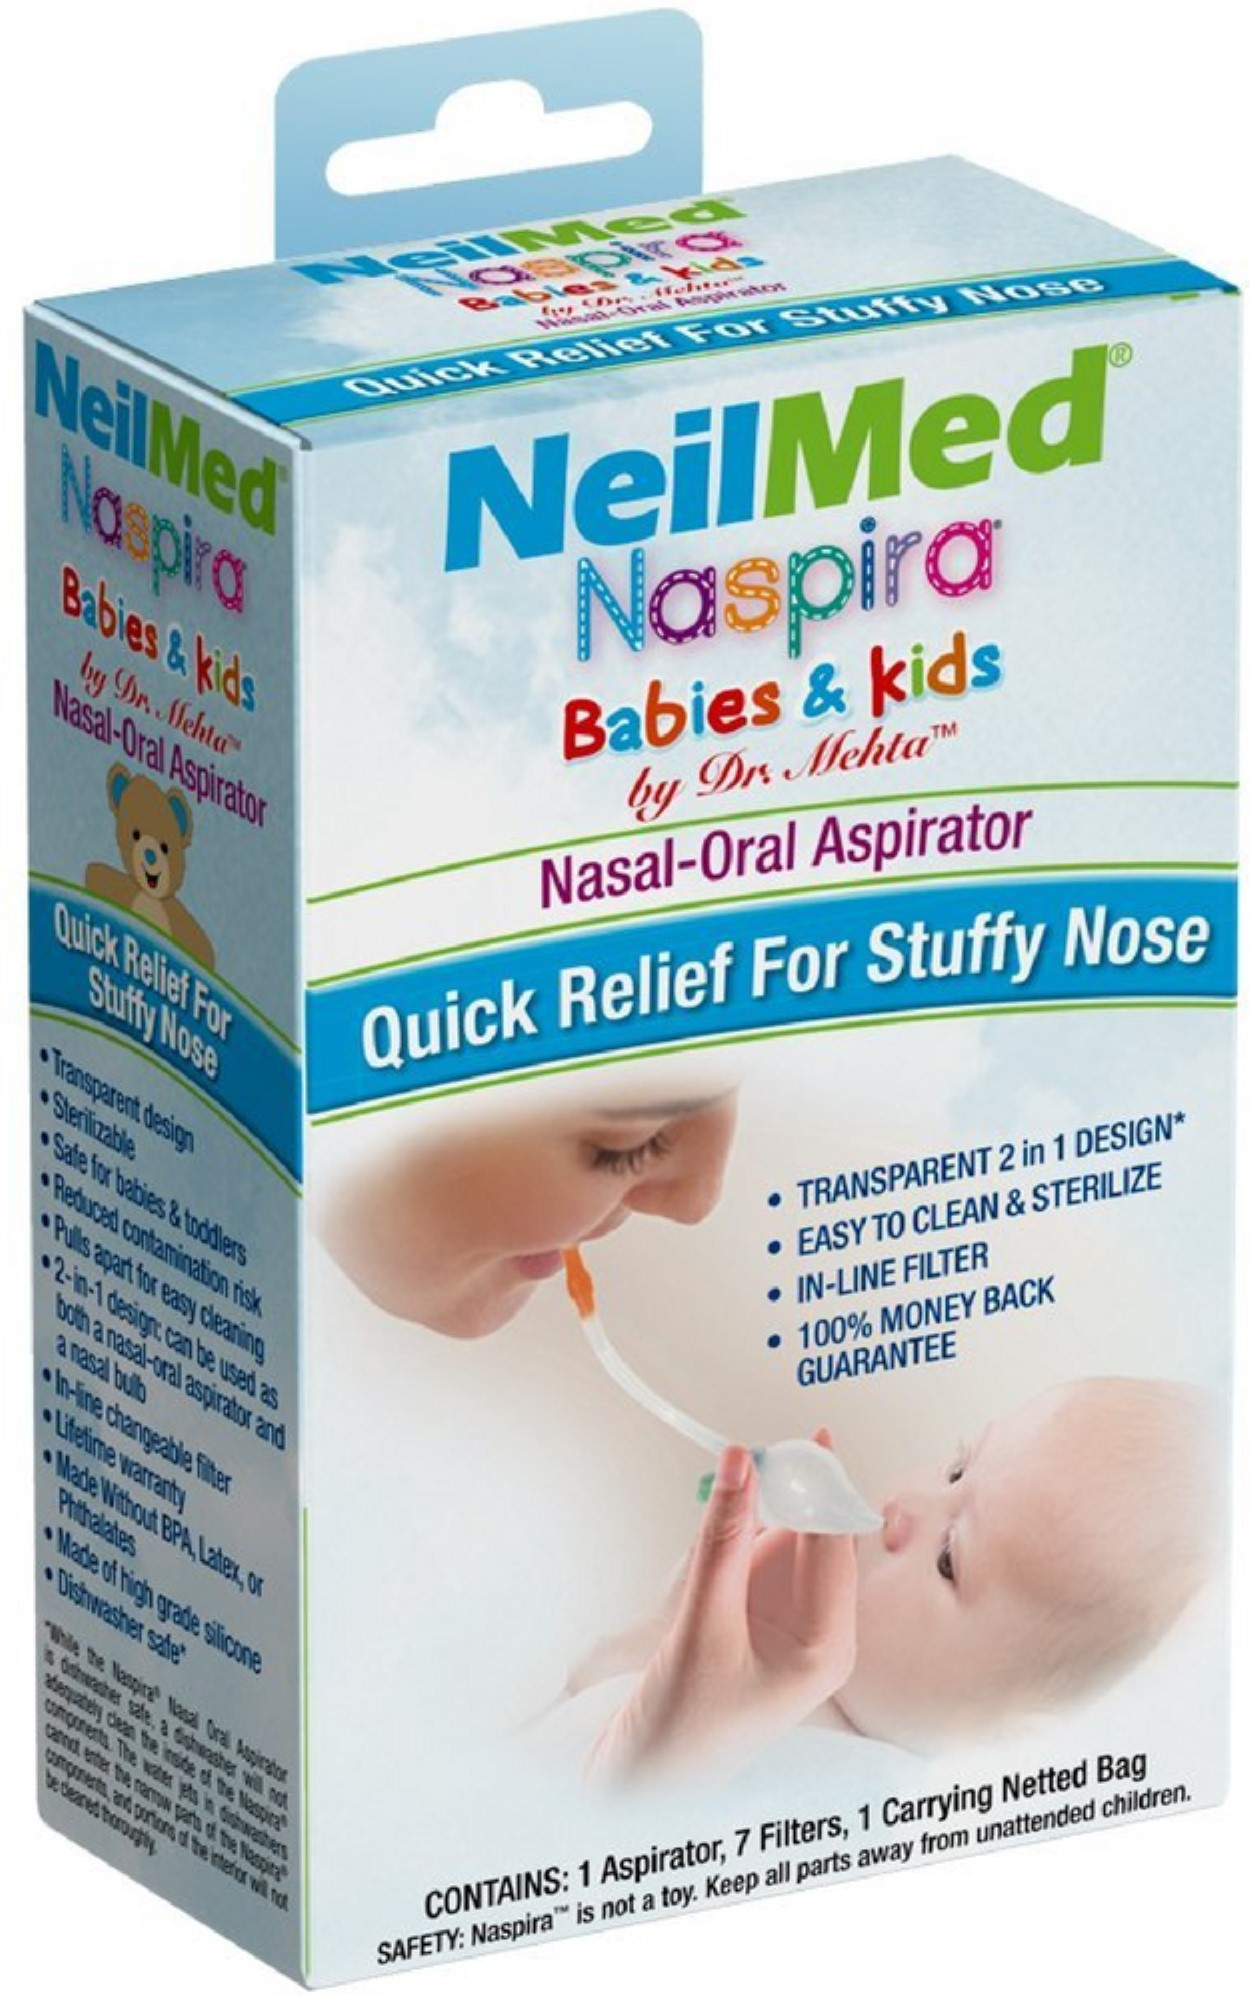 NeilMed Naspira Babies & Kids Nasal-Oral Aspirator Kit 1 ea (Pack of 3)